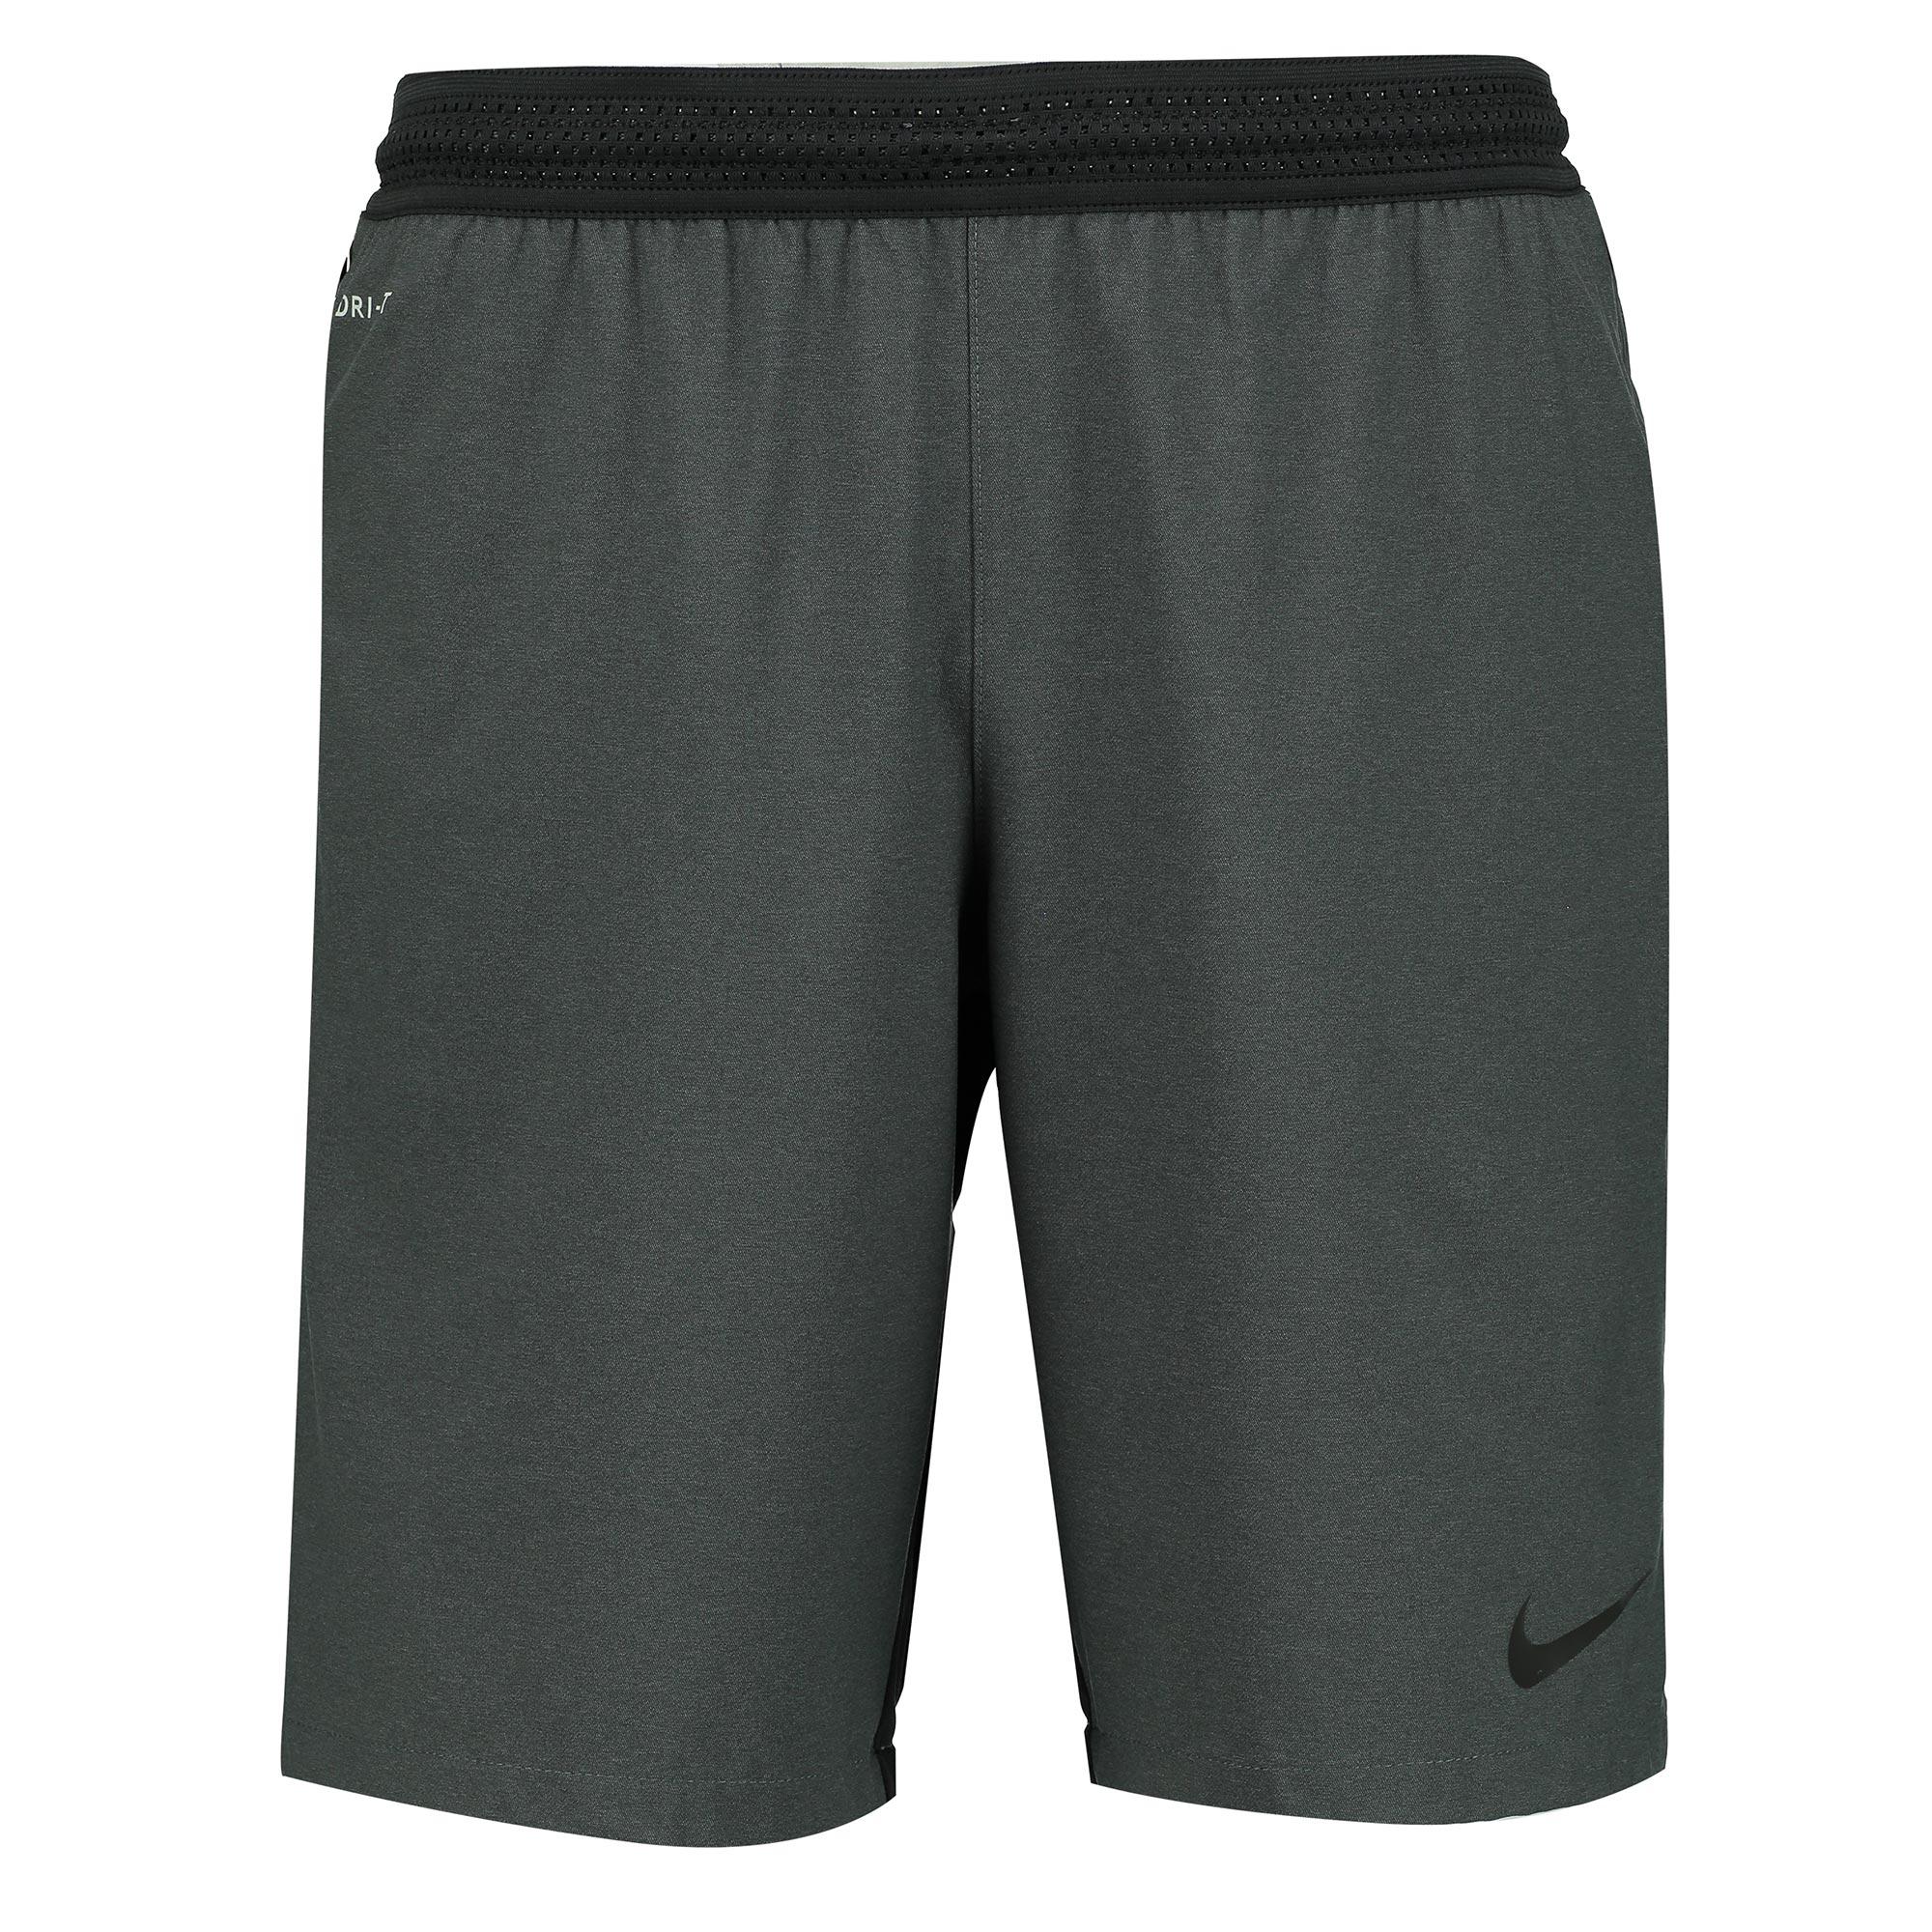 Nike Strike X Woven Shorts - Black/Black/Black